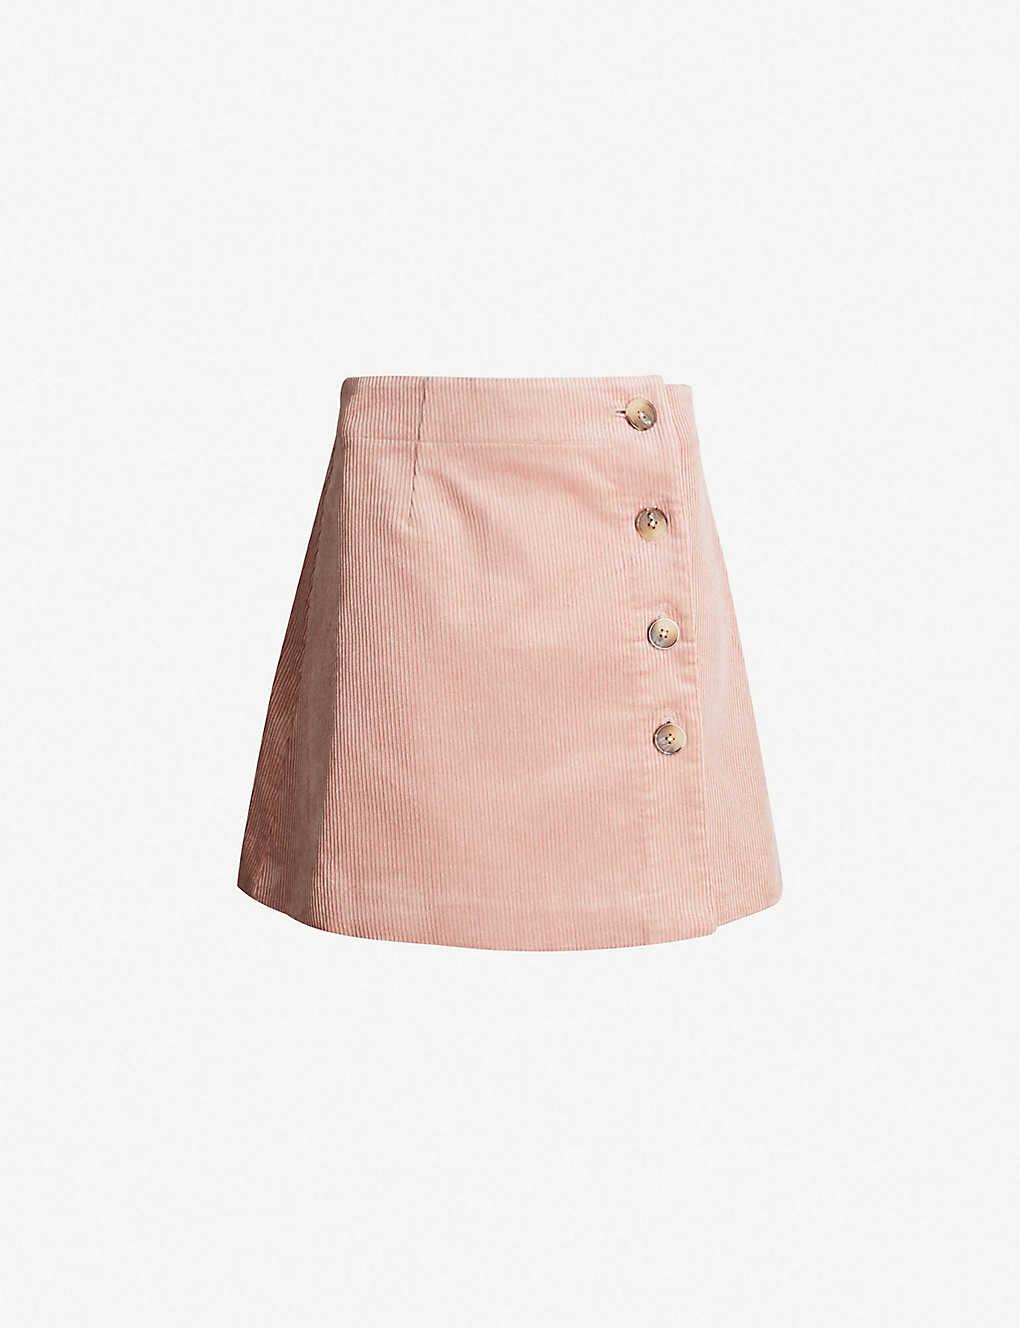 075f209eb0 WHISTLES - Cord high-rise corduroy mini skirt | Selfridges.com